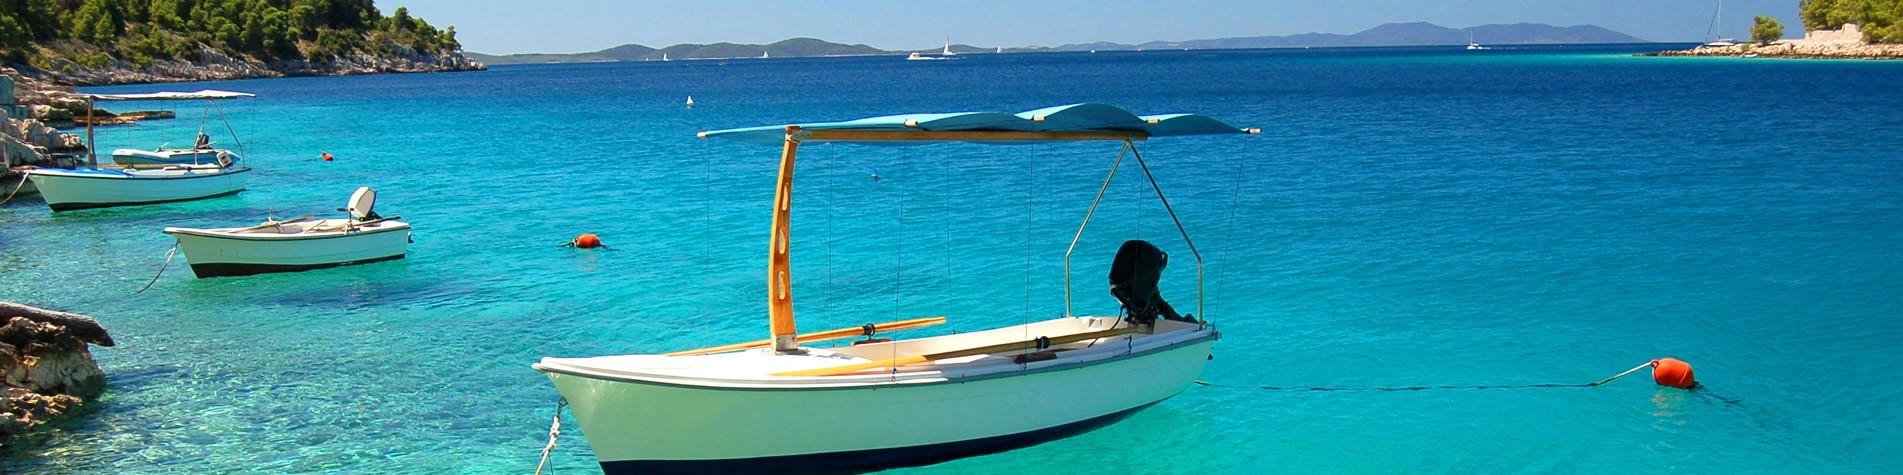 Brac Island Dalmatia Holidays with Cyplon Holidays